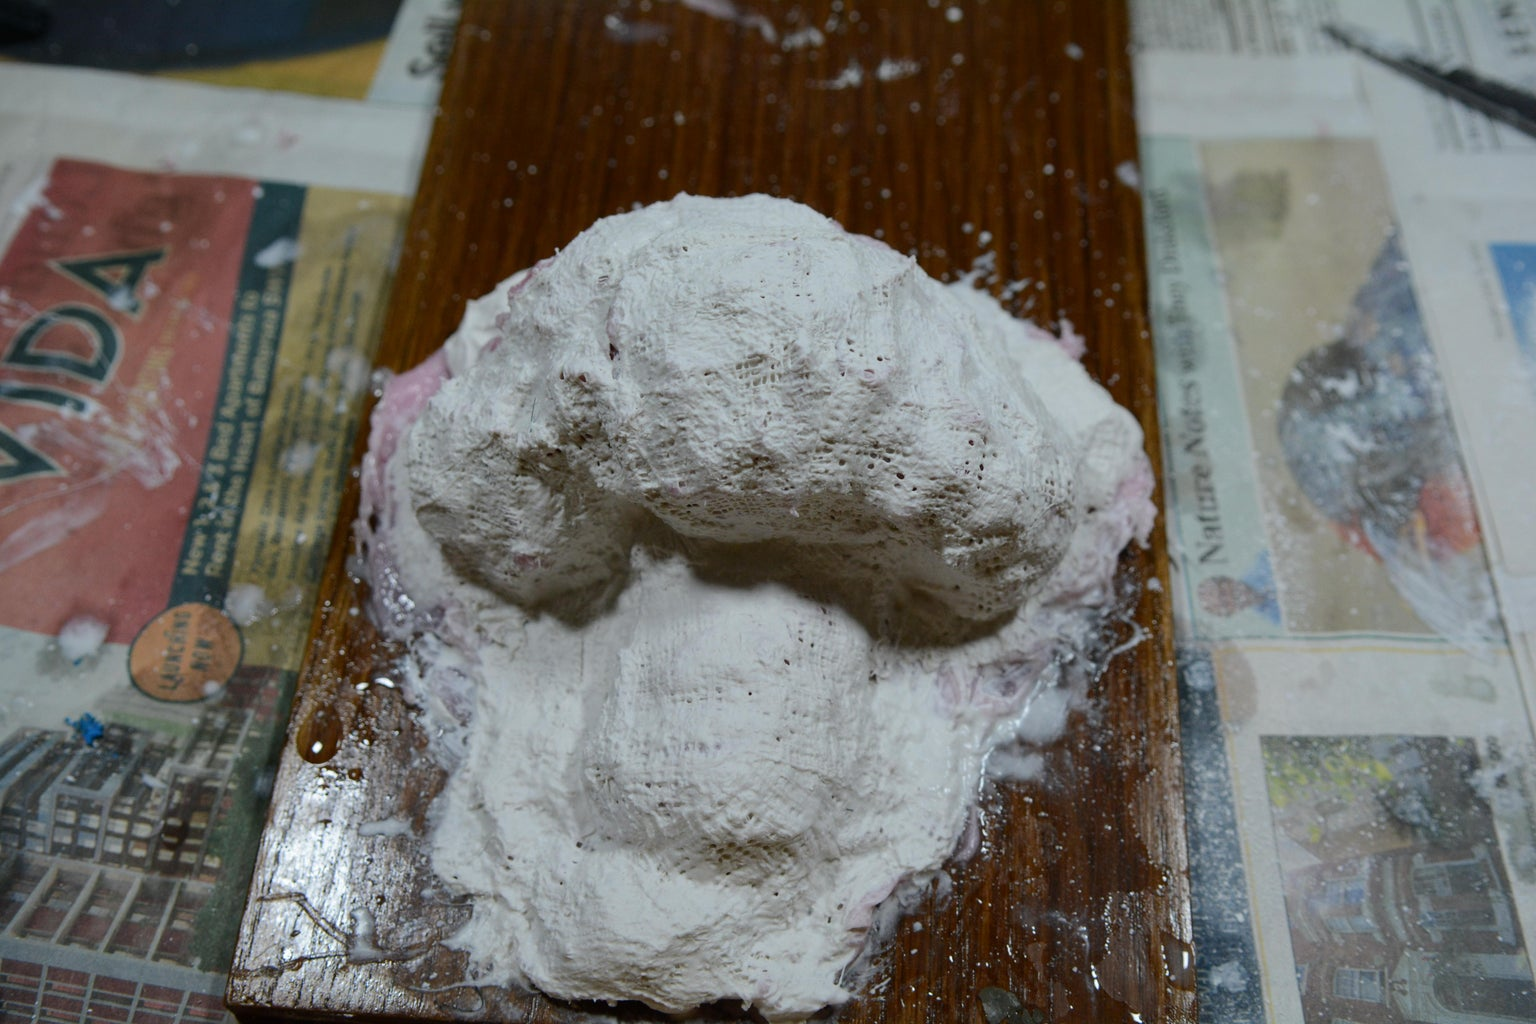 Plaster/Cement Casing